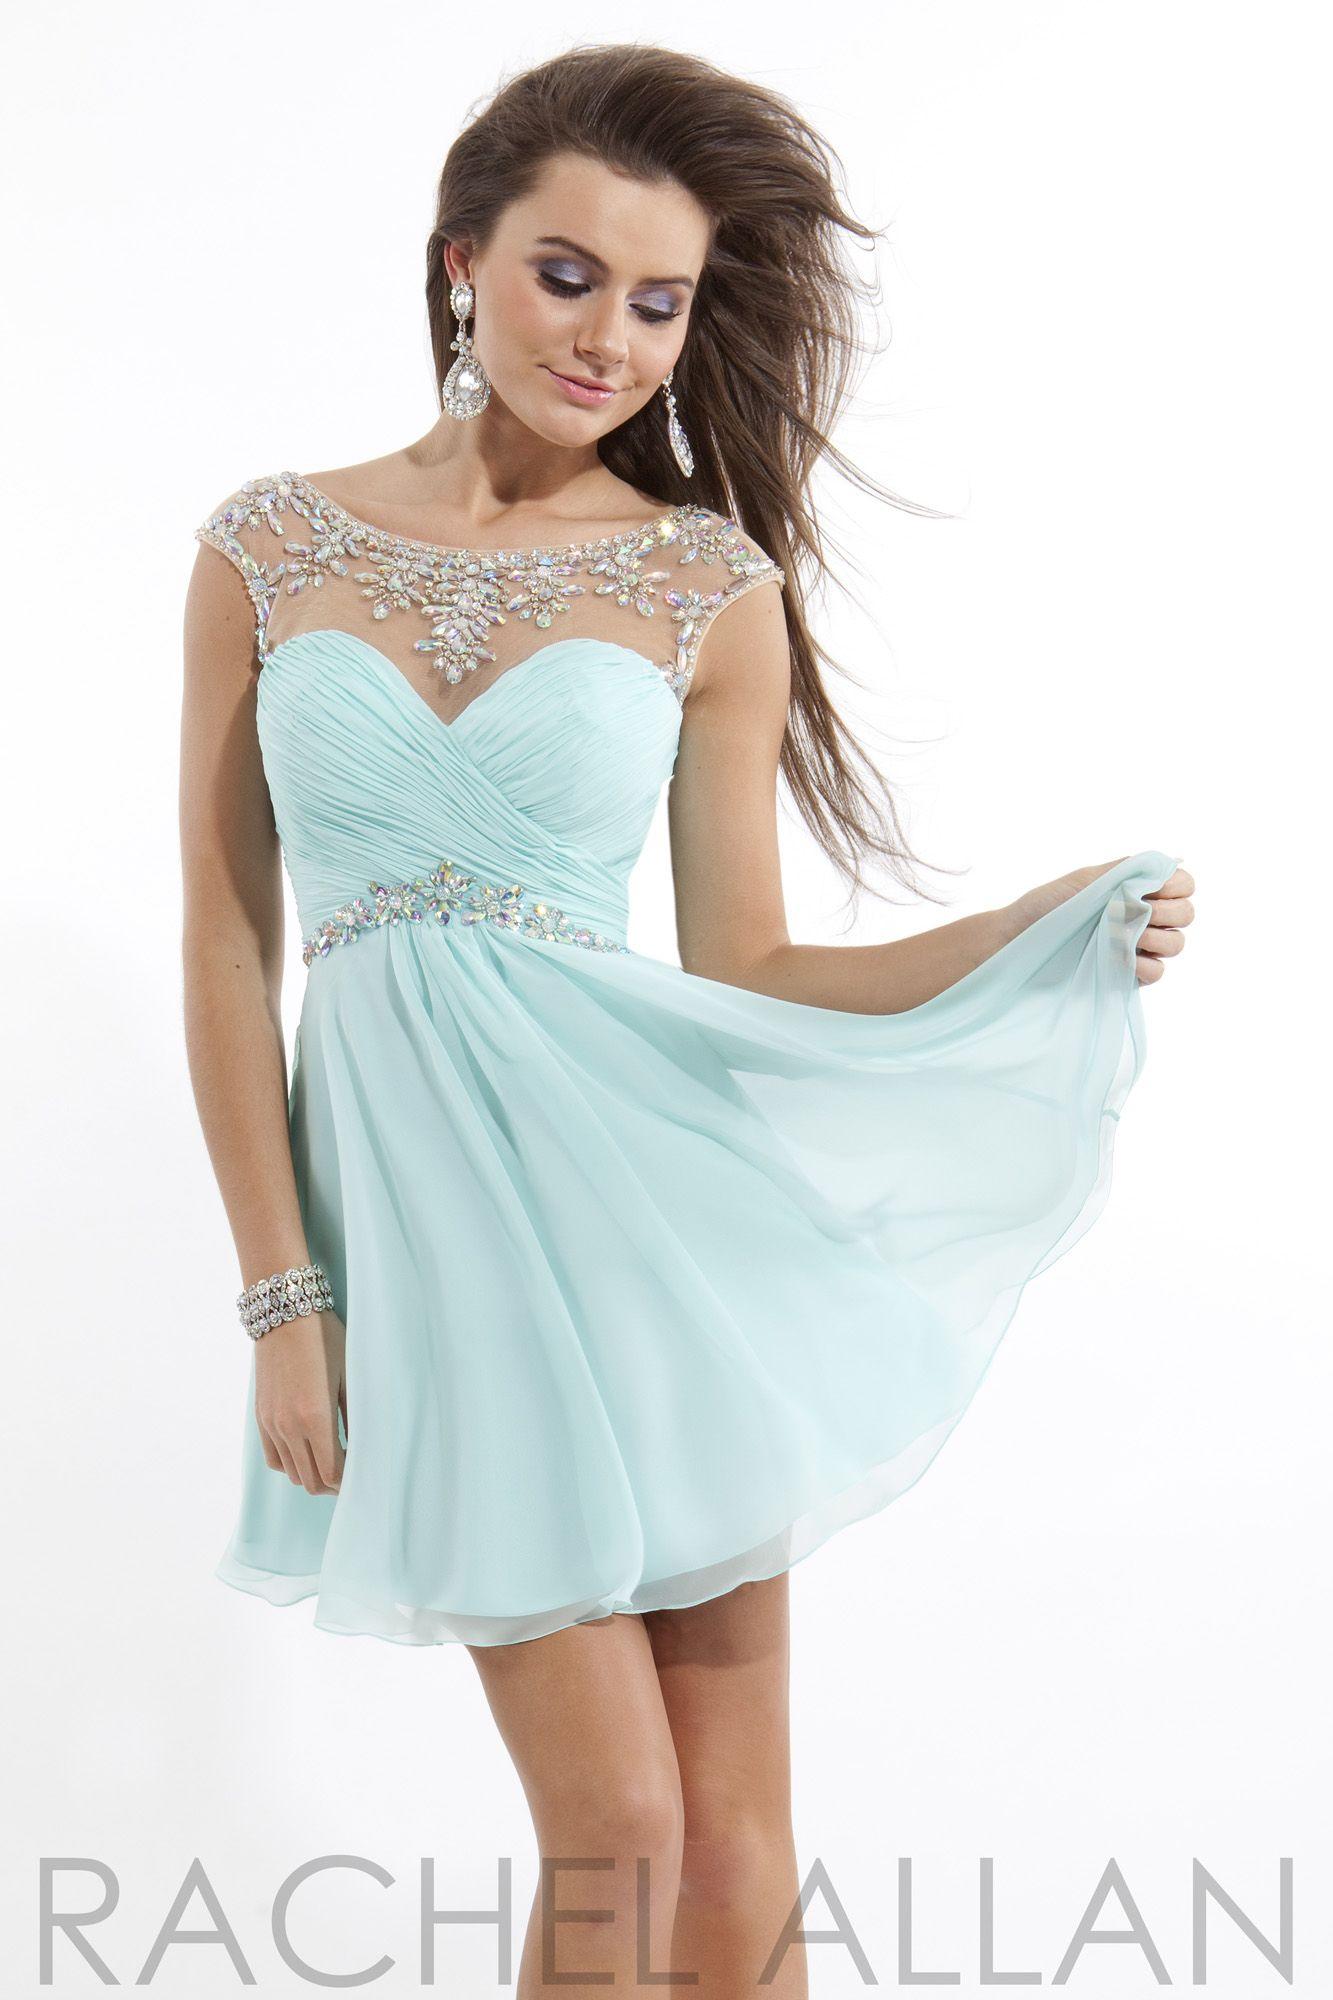 Rachel Allan Mint Green Beaded Illusion Short Prom Dress